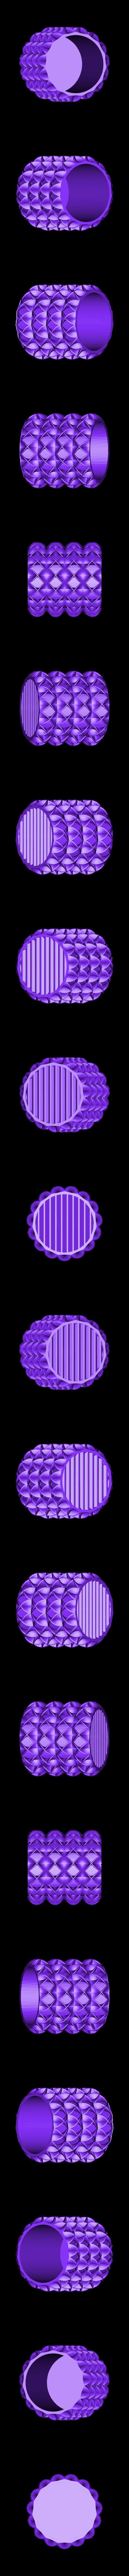 twistedlofts1.stl Download free STL file TwistedLofts1 • Design to 3D print, Birk